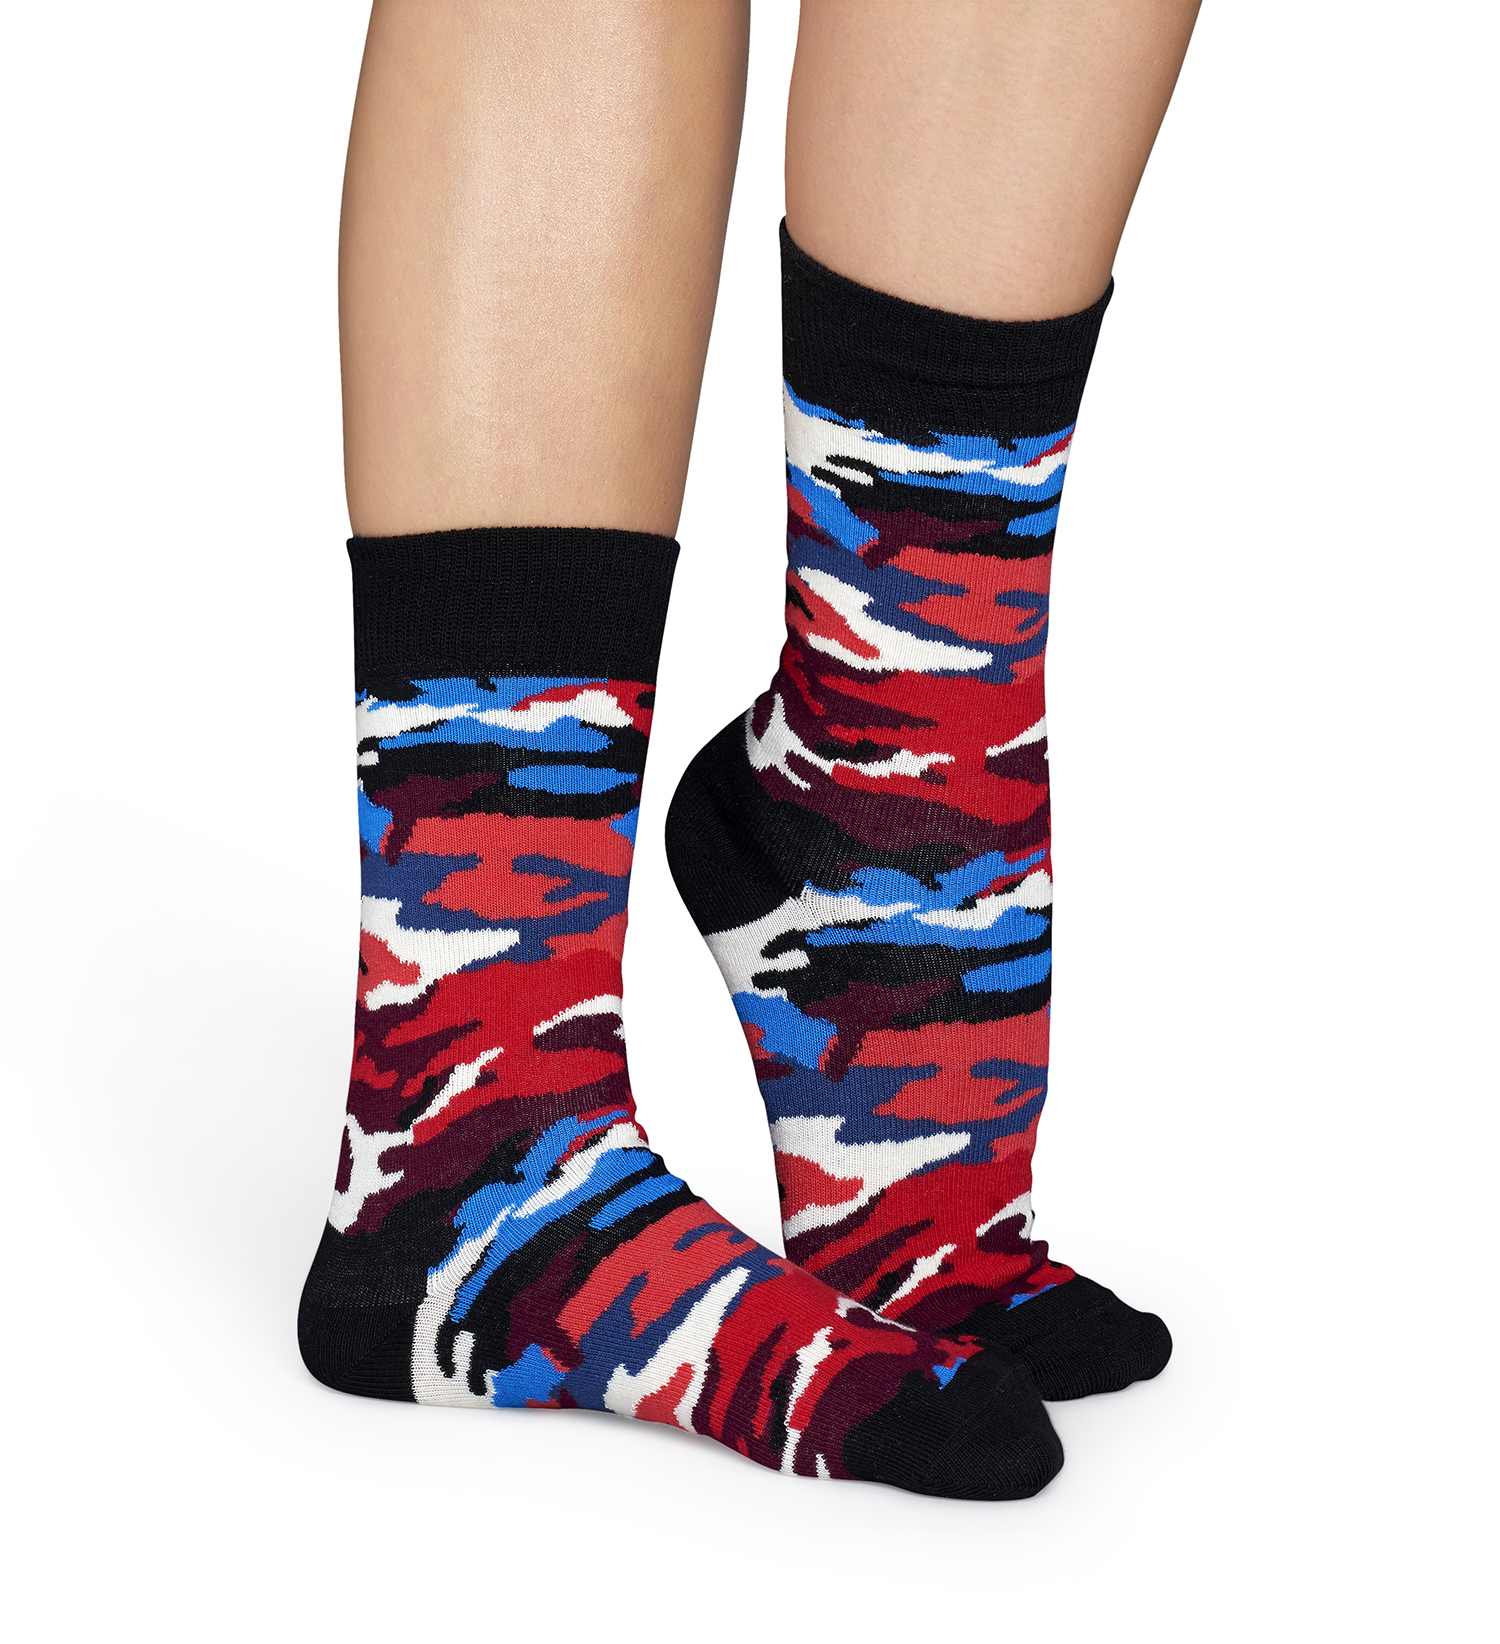 Barevné ponožky Happy Socks s maskáčovým vzorem Bark - S-M (36-40 ... cc43c57d8e